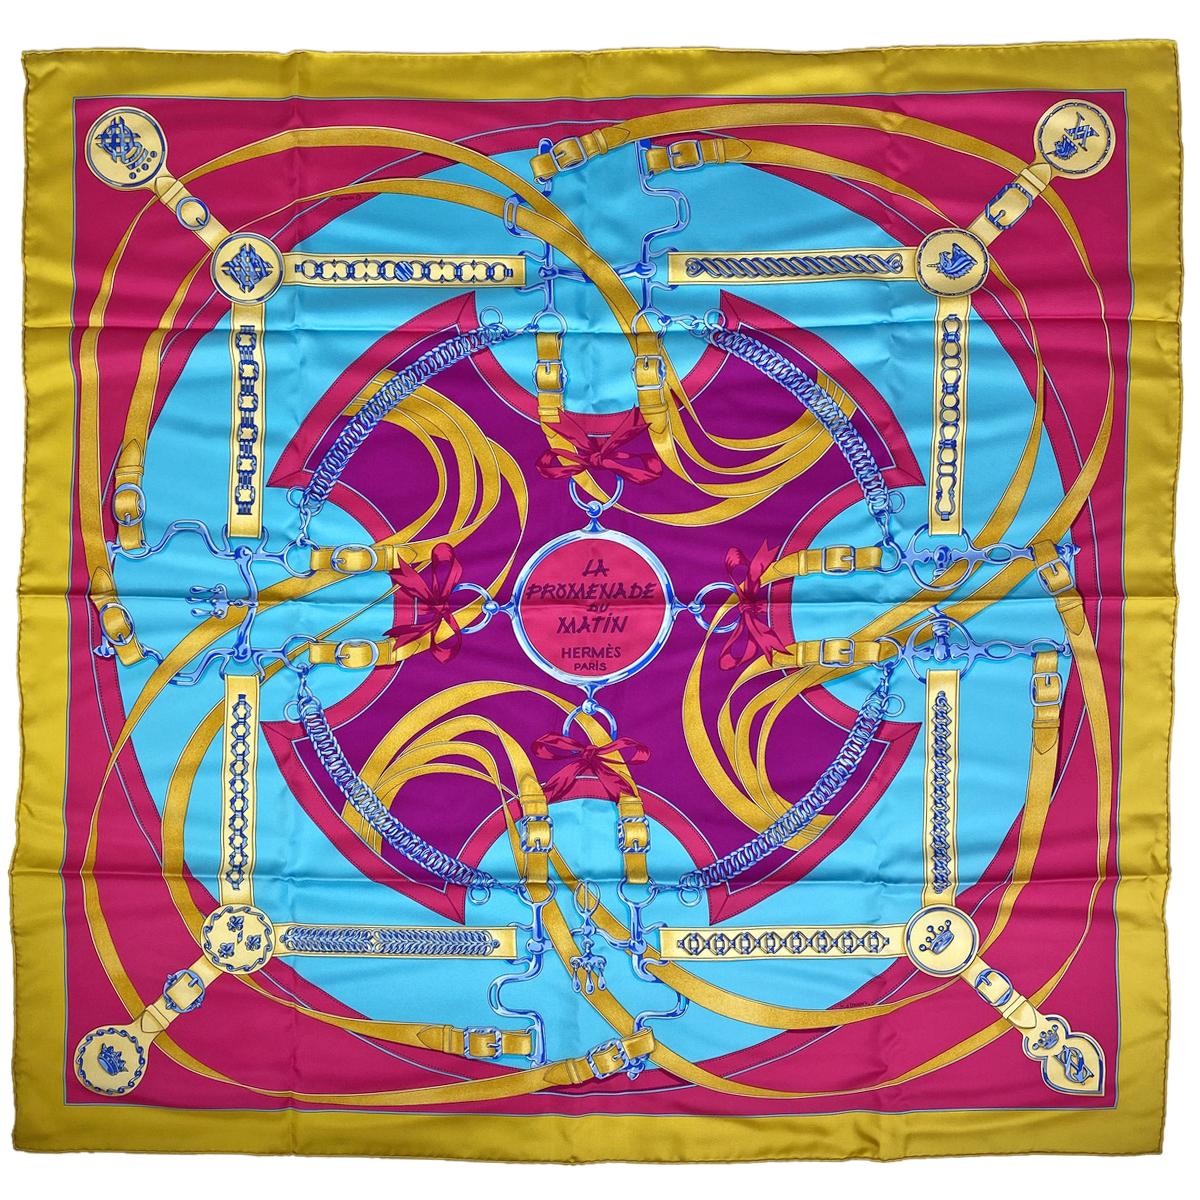 USED 送料無料 エルメス HERMES カレ 90 LA PROMENADE DU MATIN 予約 中古 ブルー レディース ピンク シルク 朝の散歩 イエロー スカーフ ついに入荷